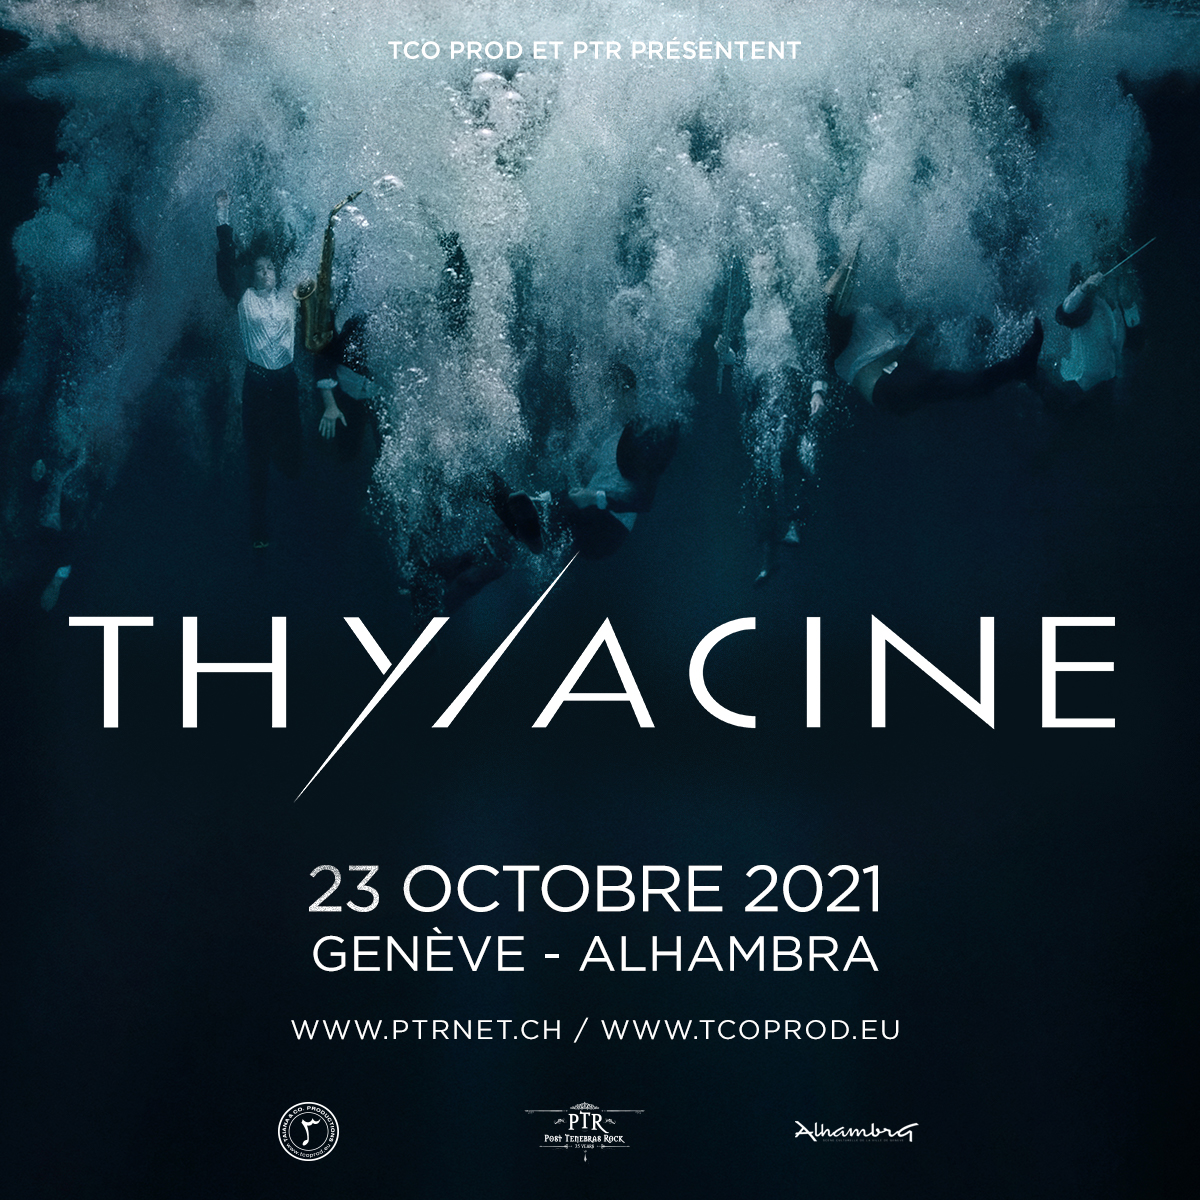 Thylacine @ Alhambra Genève